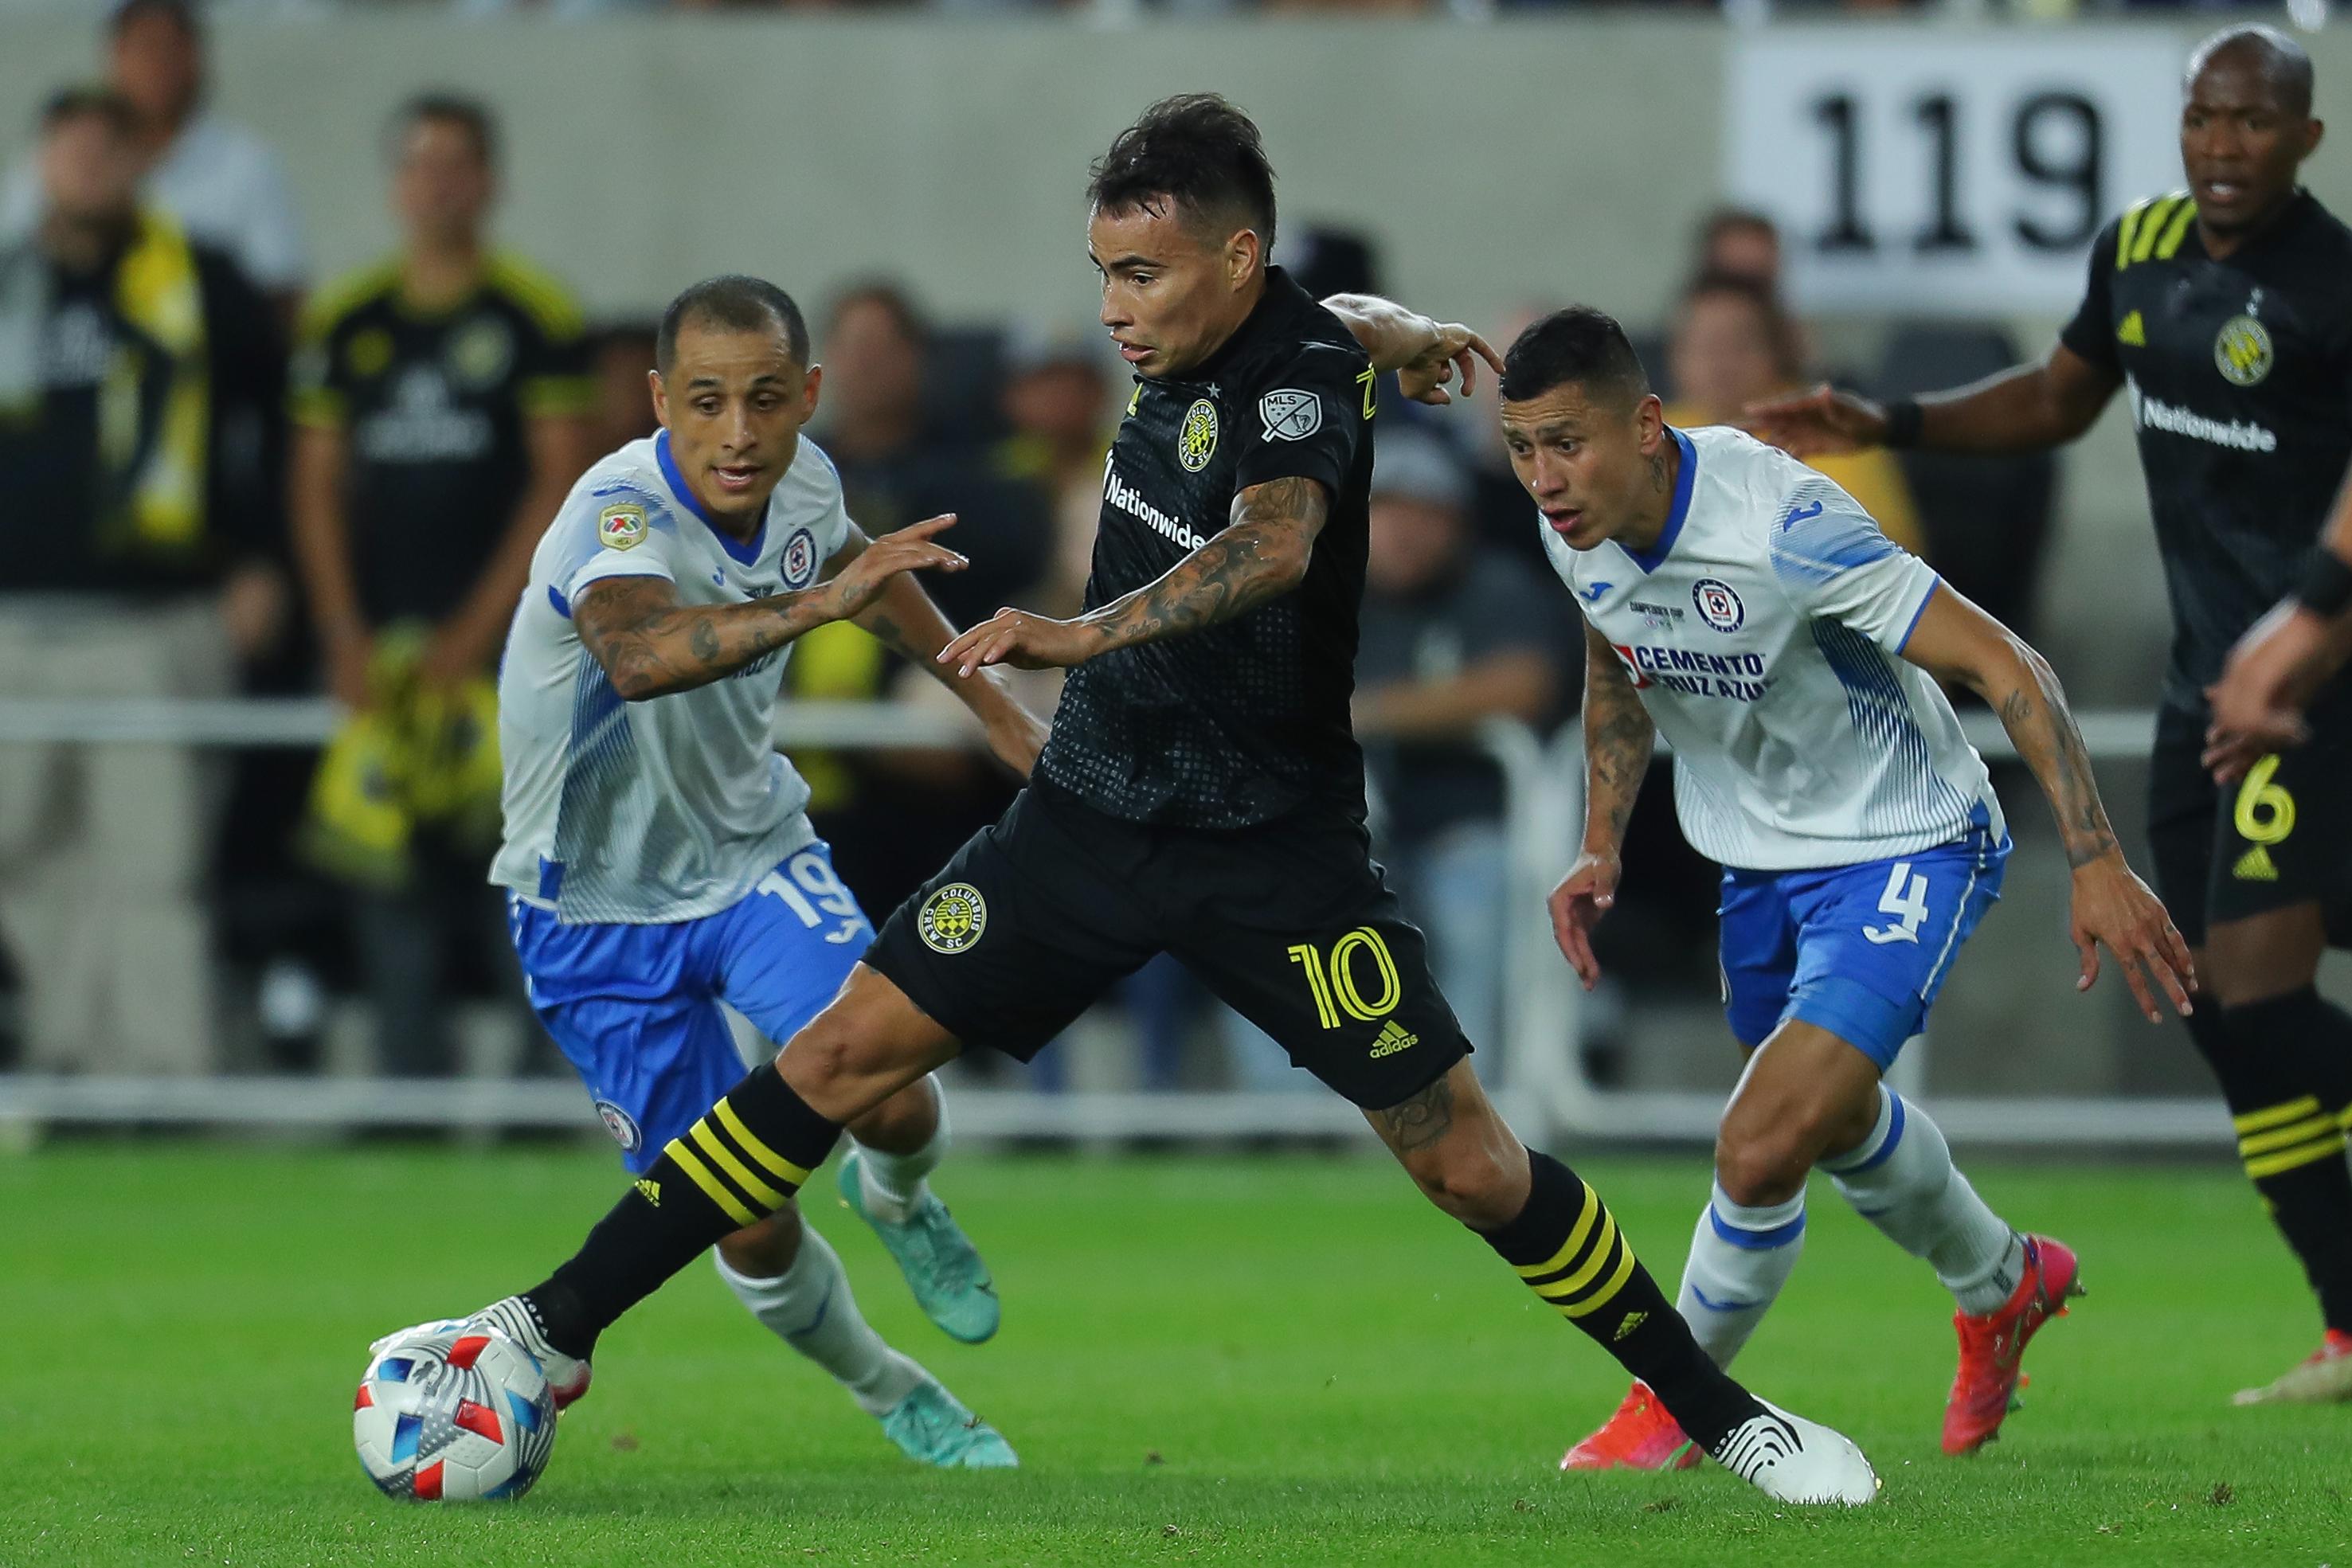 2021 Campeones Cup - Deportivo Cruz Azul v Columbus Crew